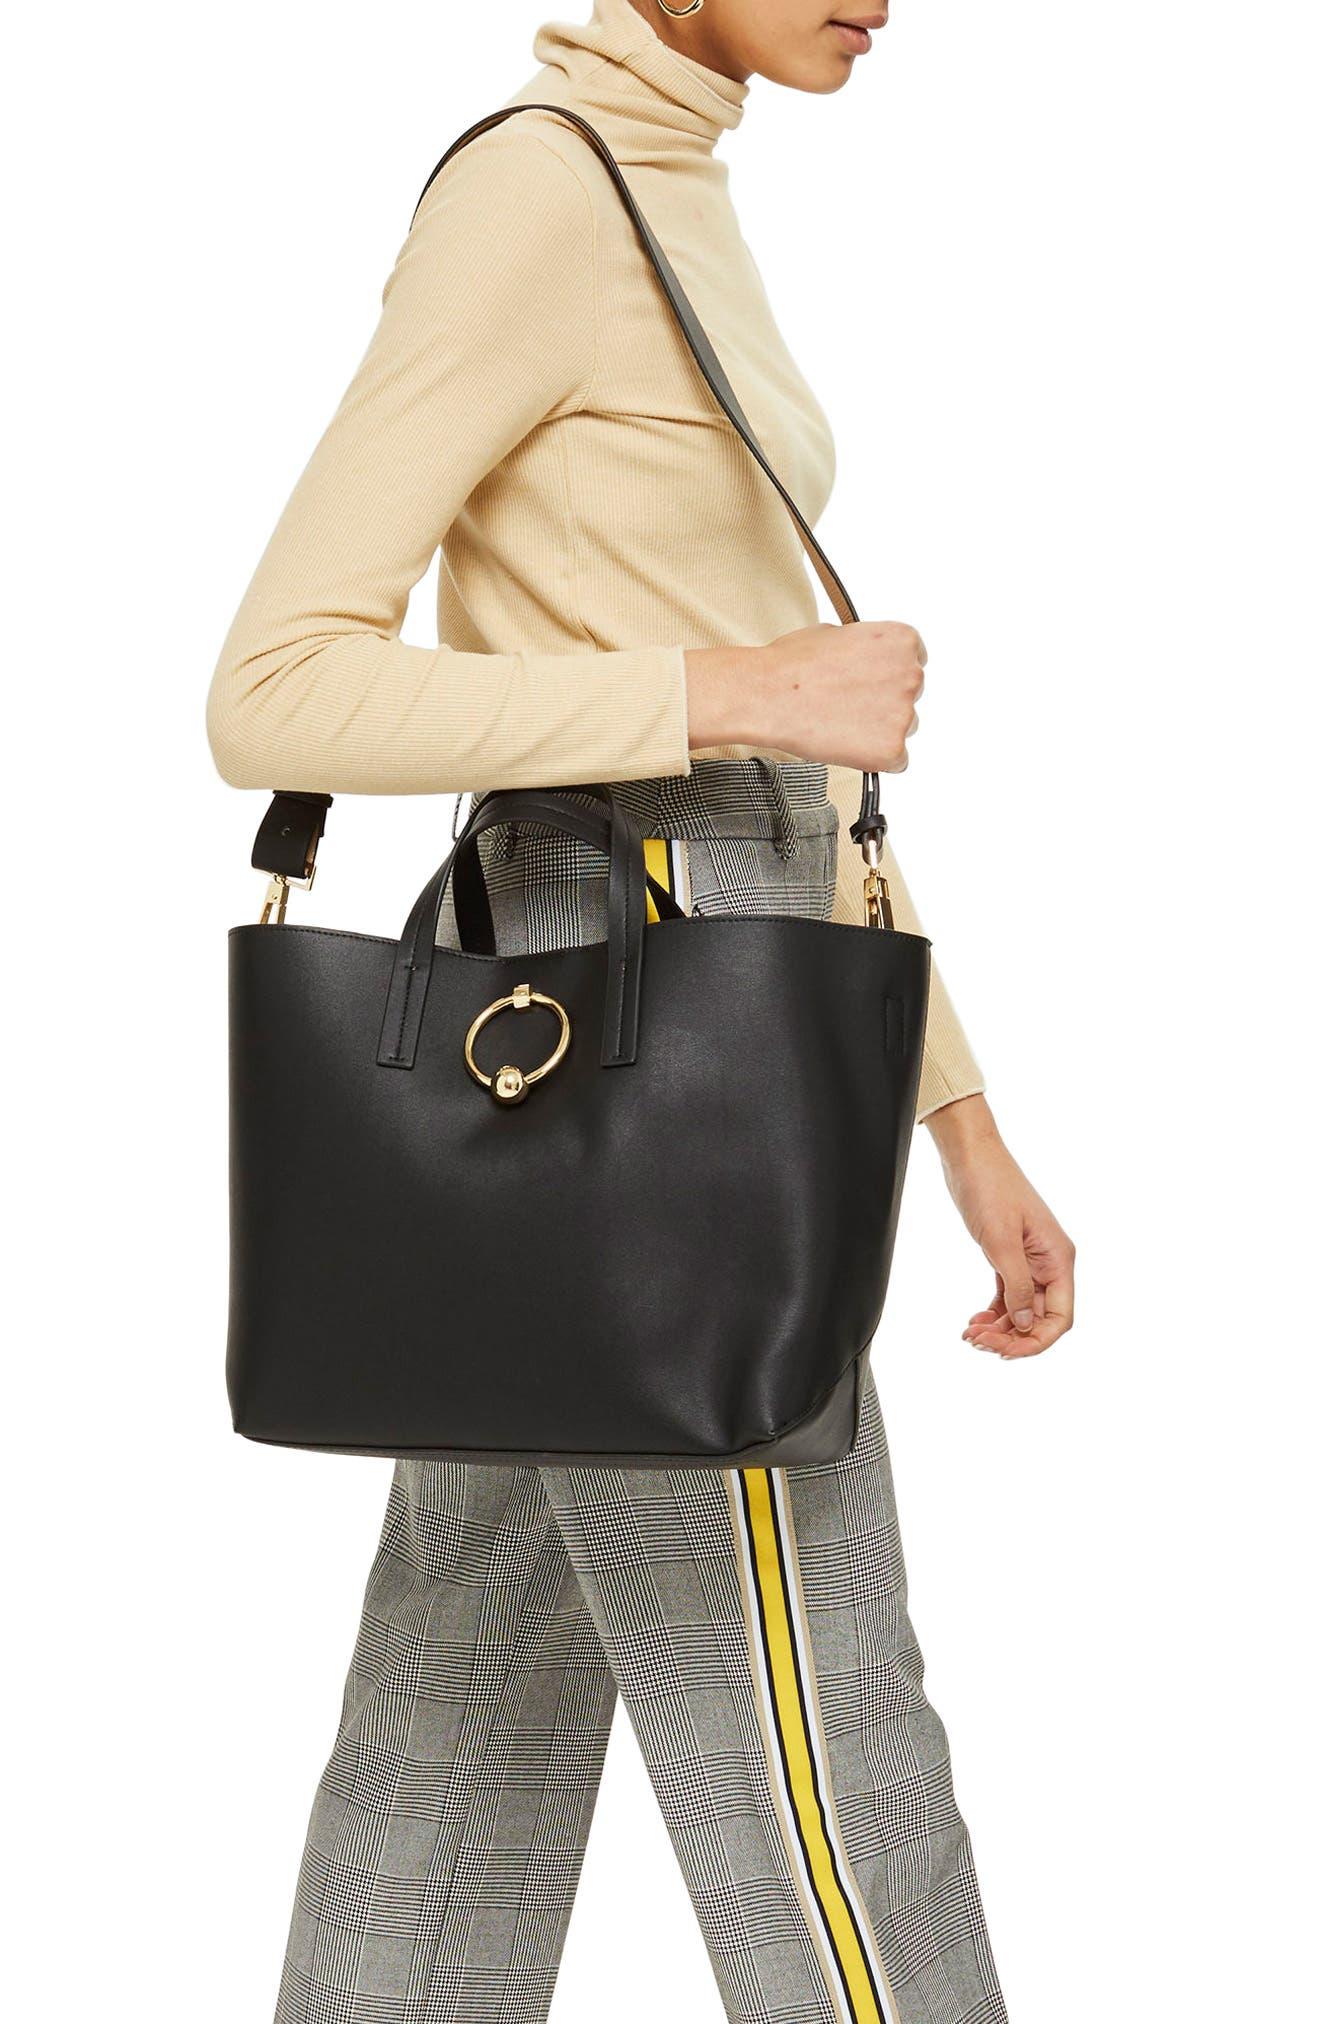 Seline Tote Bag,                             Alternate thumbnail 3, color,                             Black